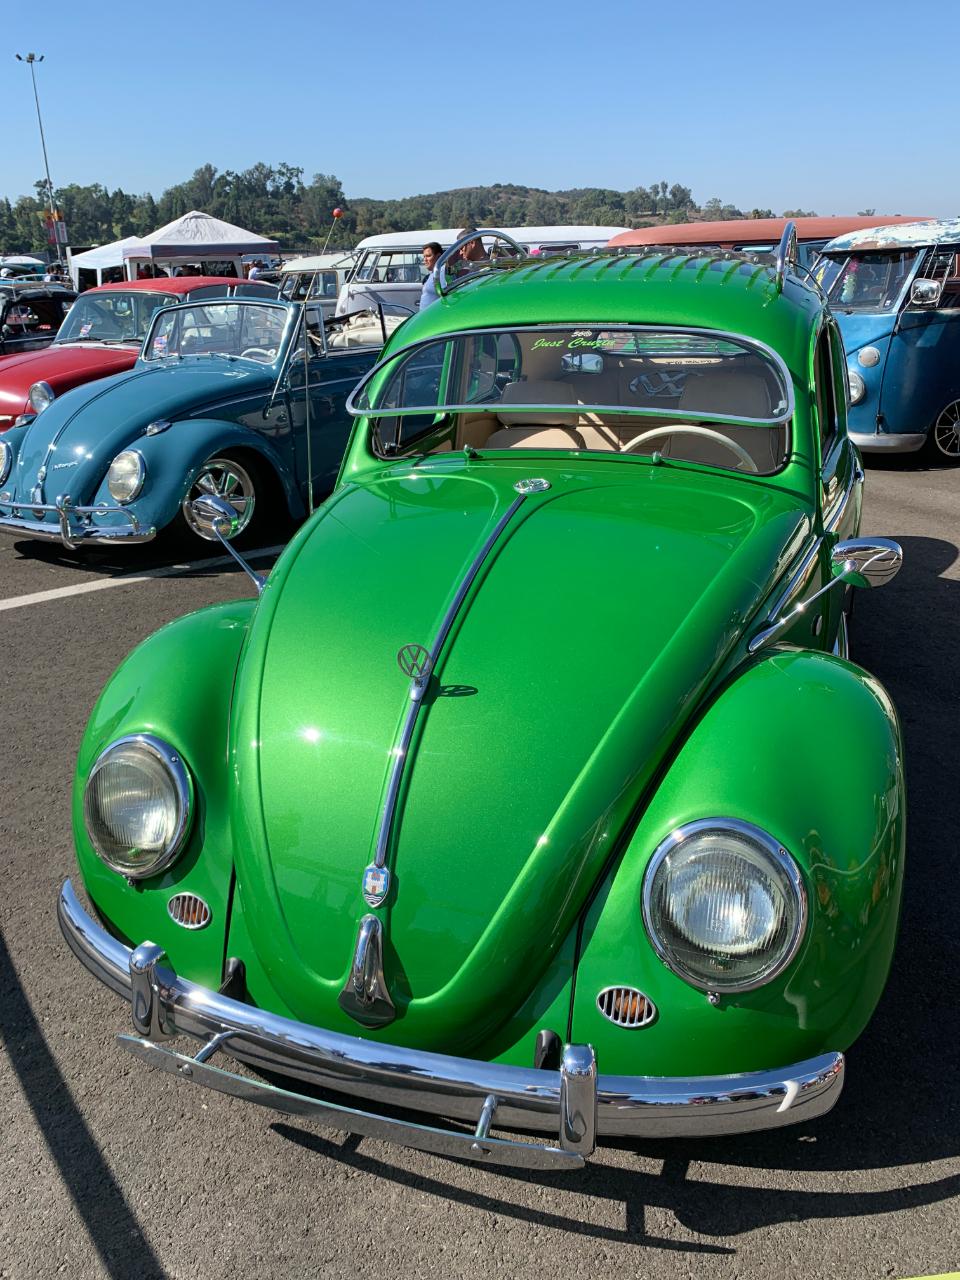 1956 VW Beetle - Front